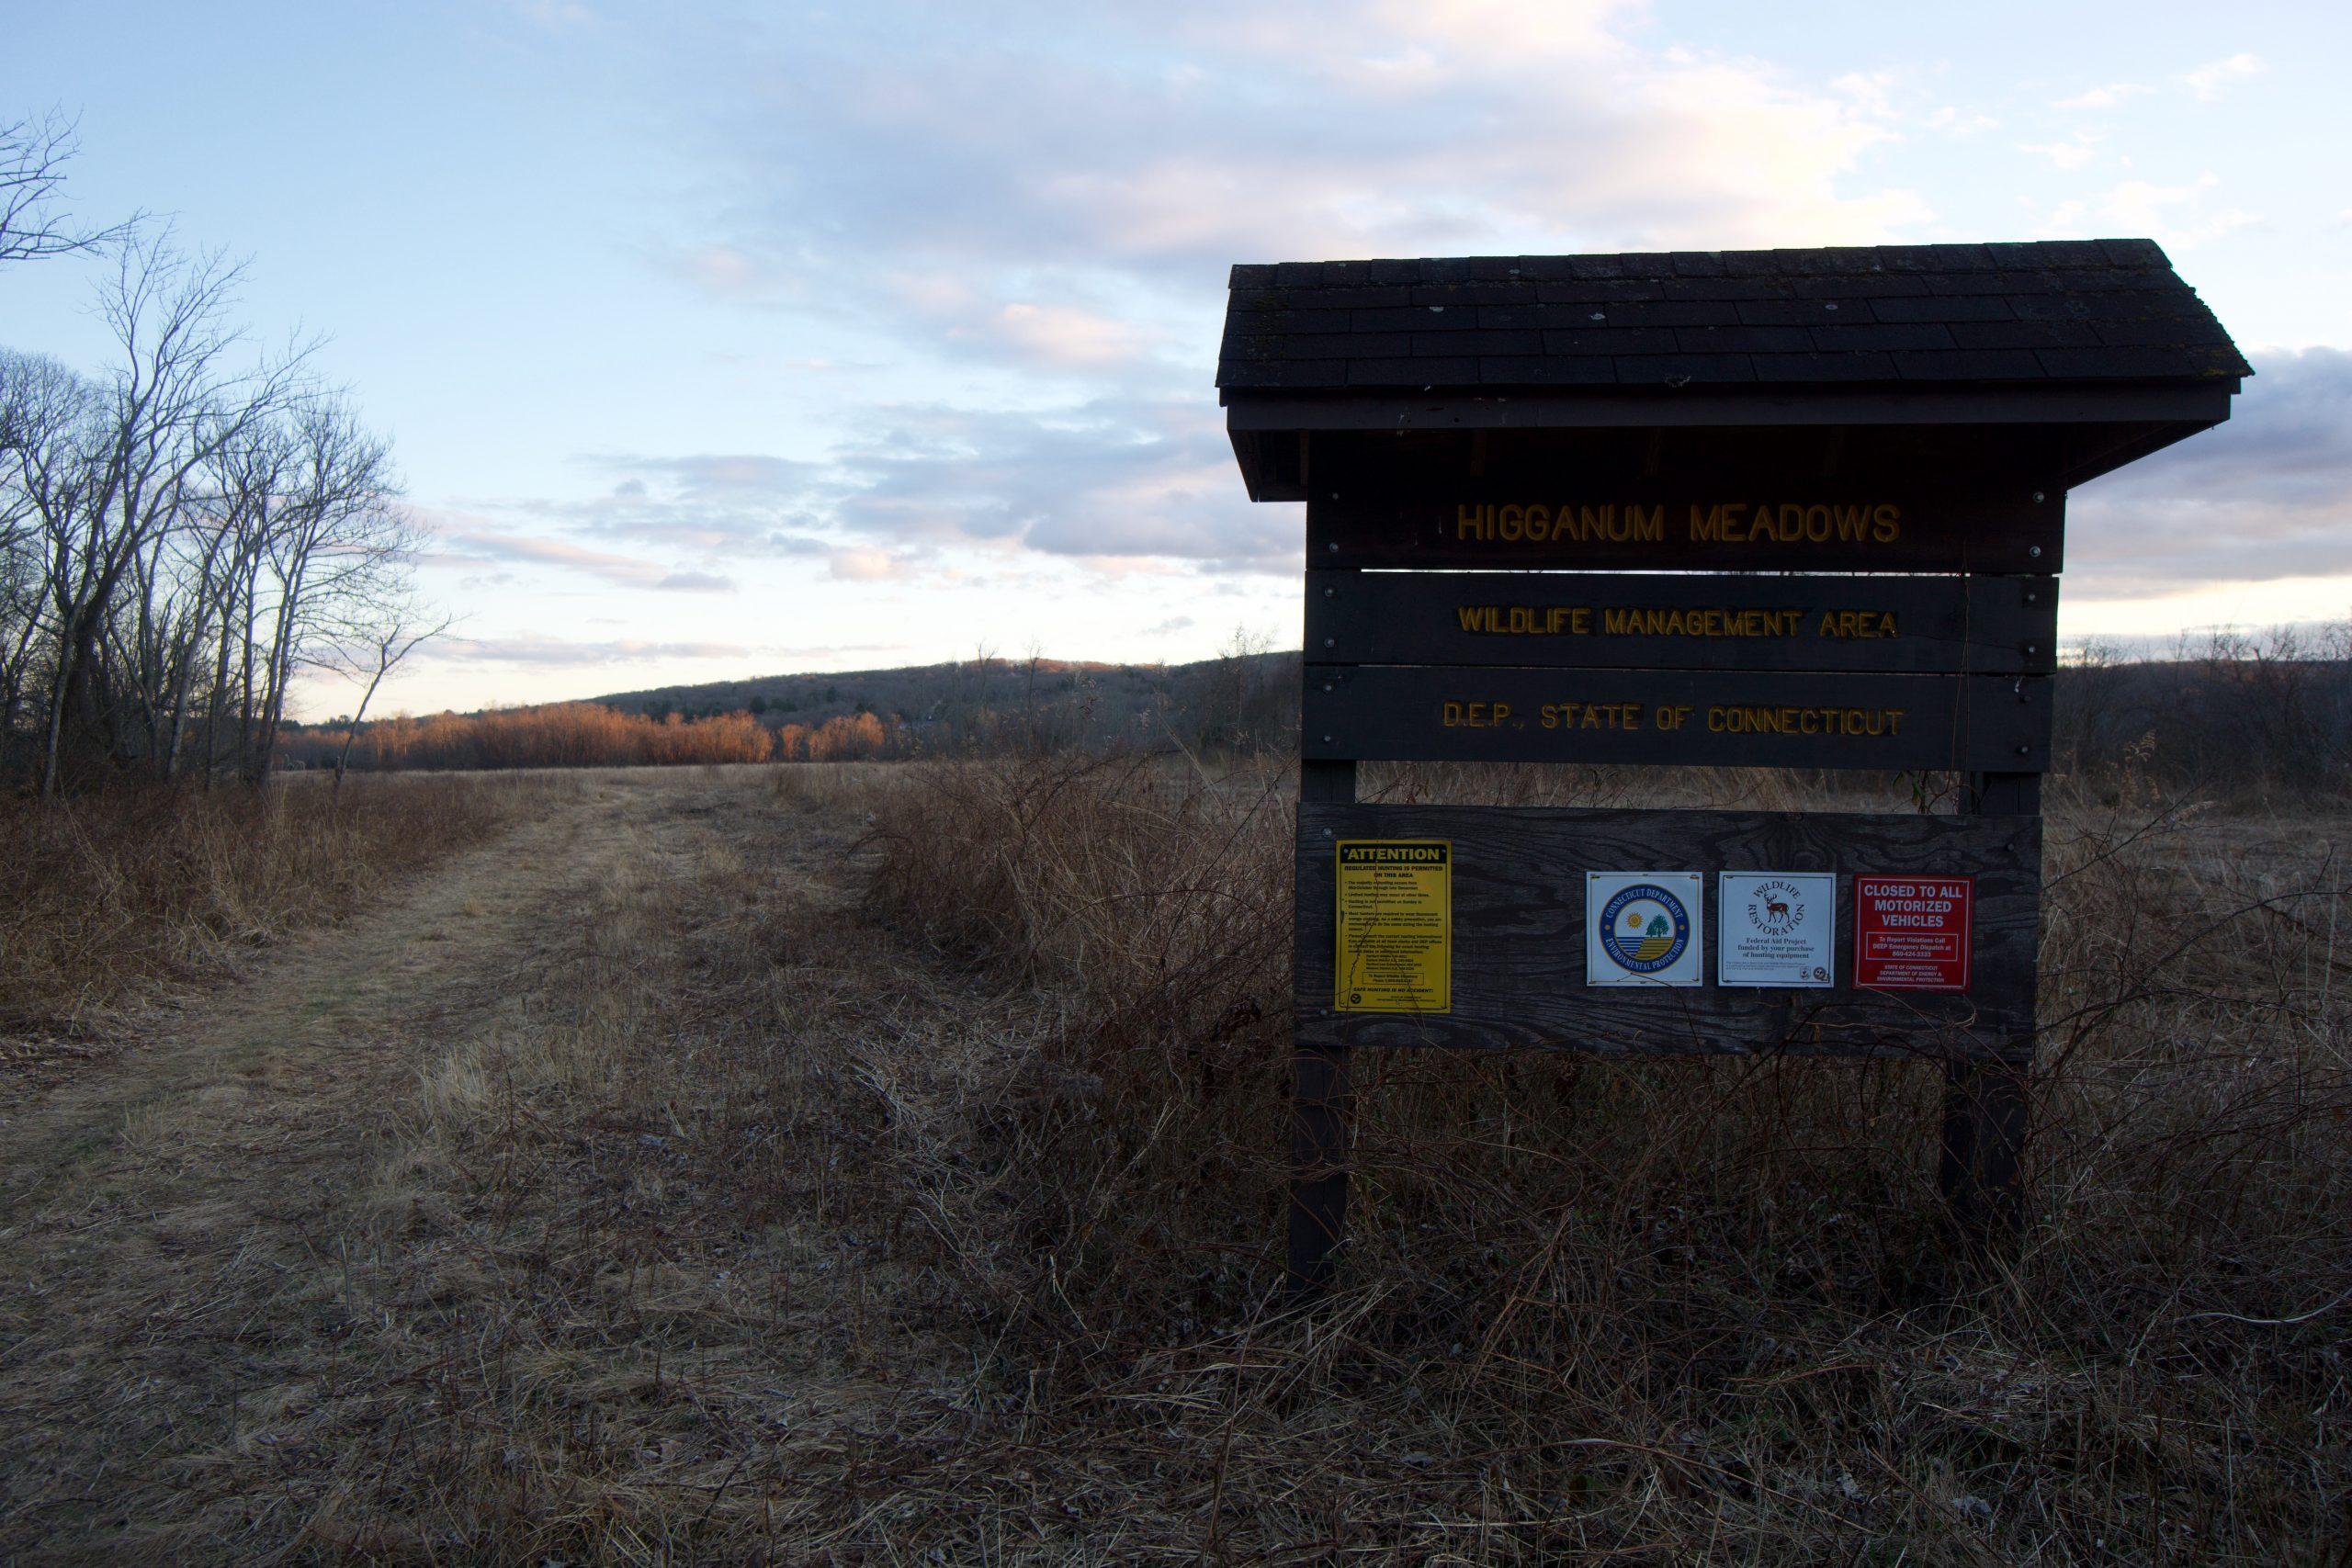 Higganum Meadows Trailhead